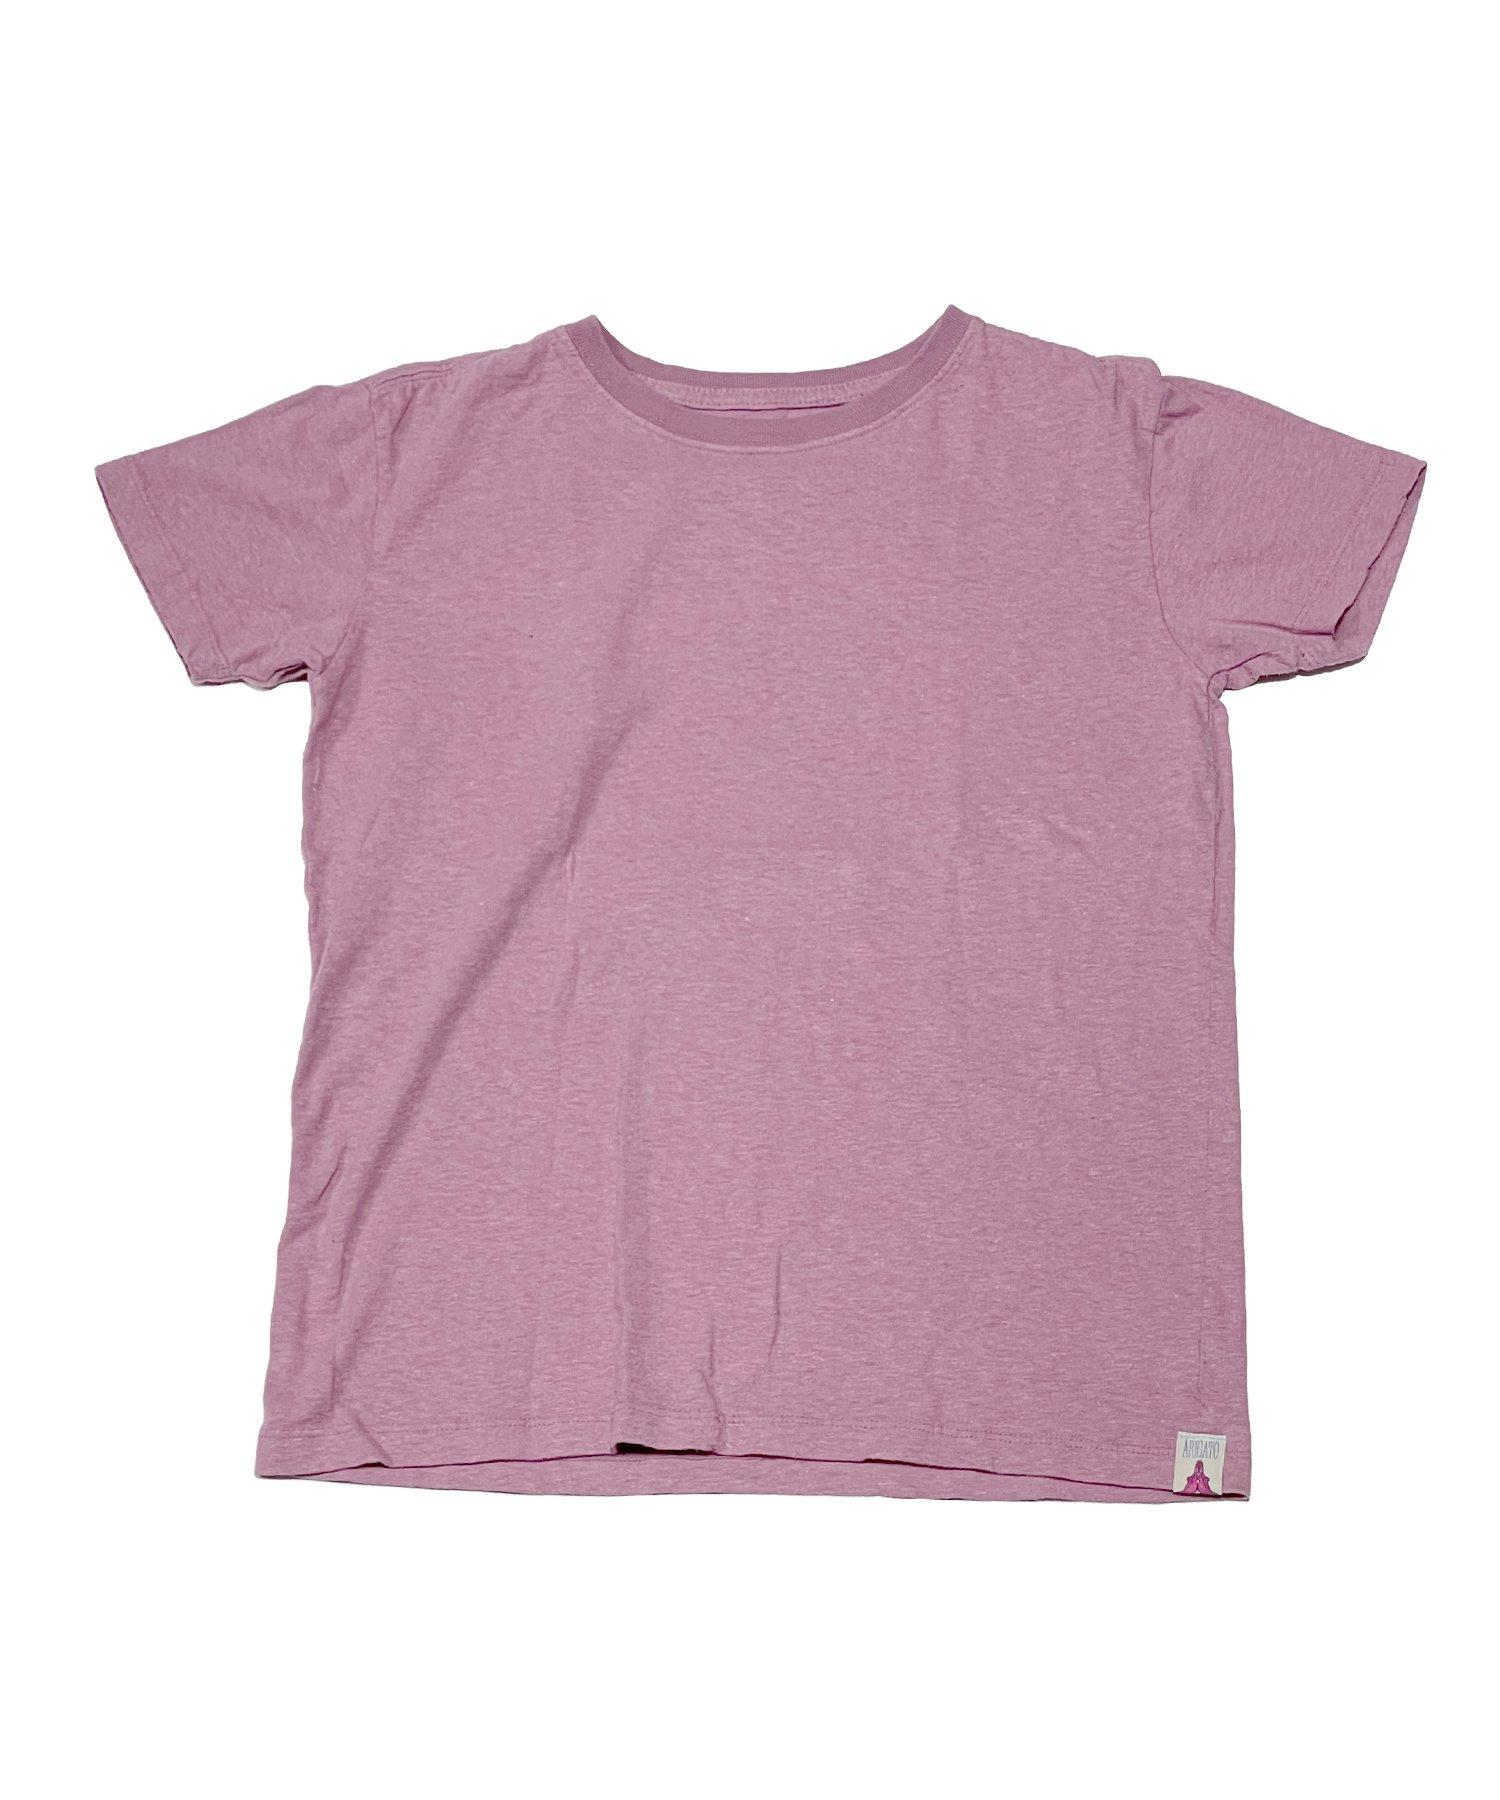 ARIGATO FAKKYU〔アリガトファッキュ〕 HEMP COTTON T-shirts(6 colors)